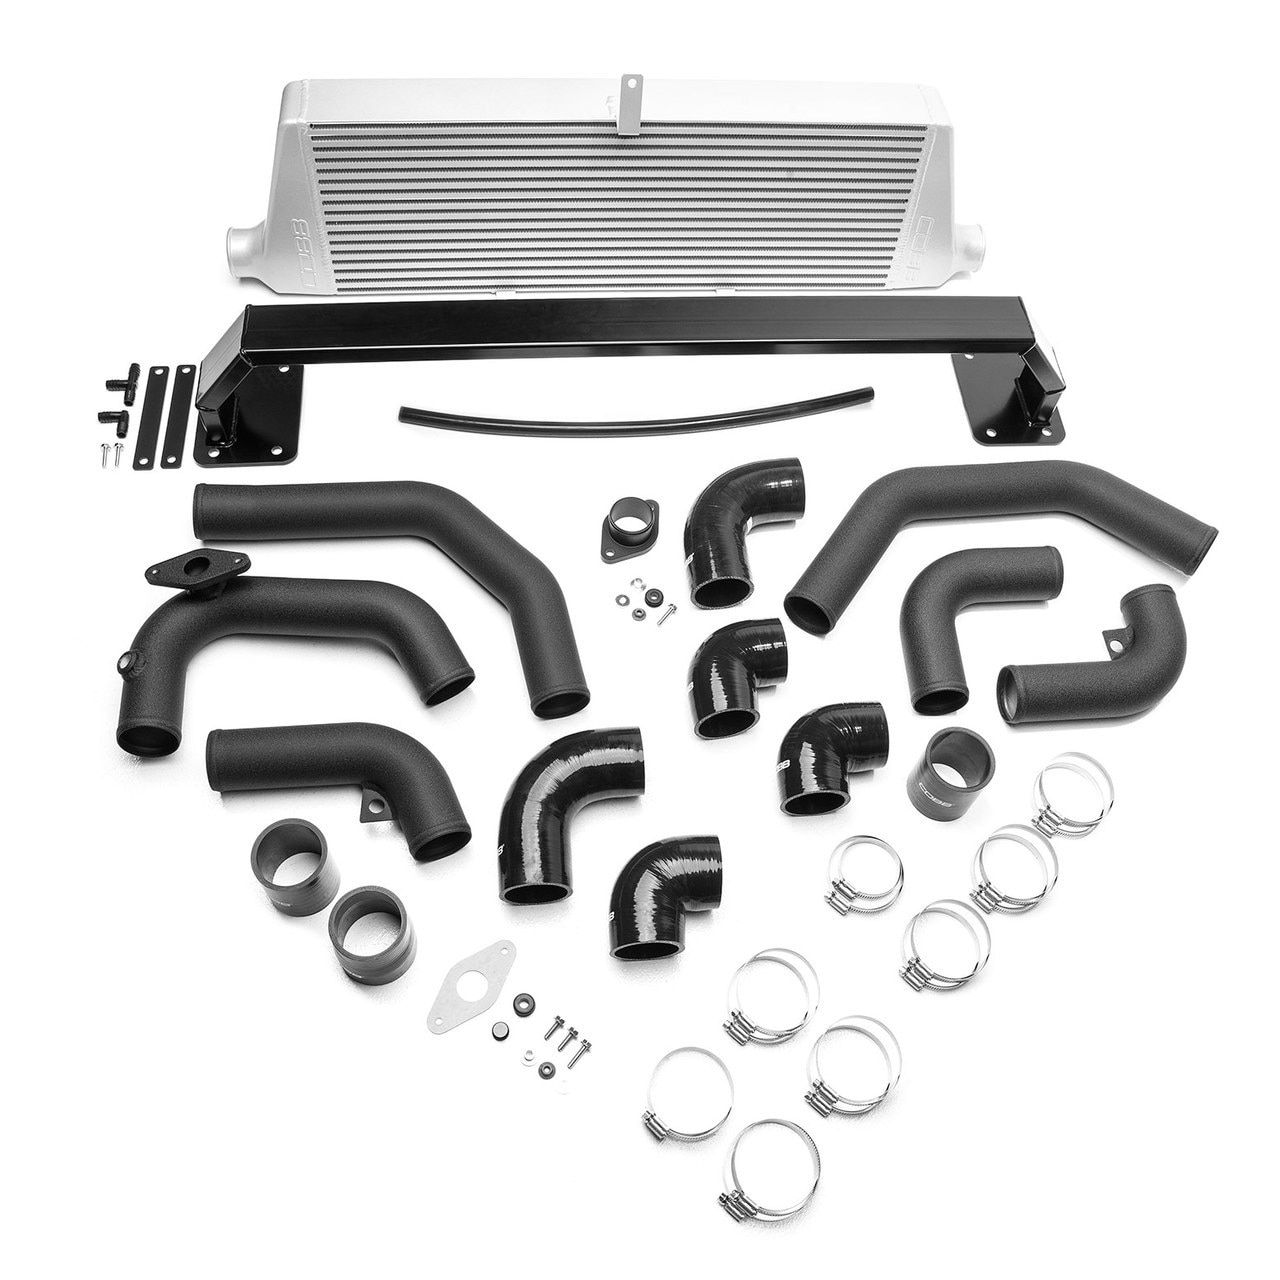 COBBFront Mount Intercooler Kit (Silver) For 1114 Subaru